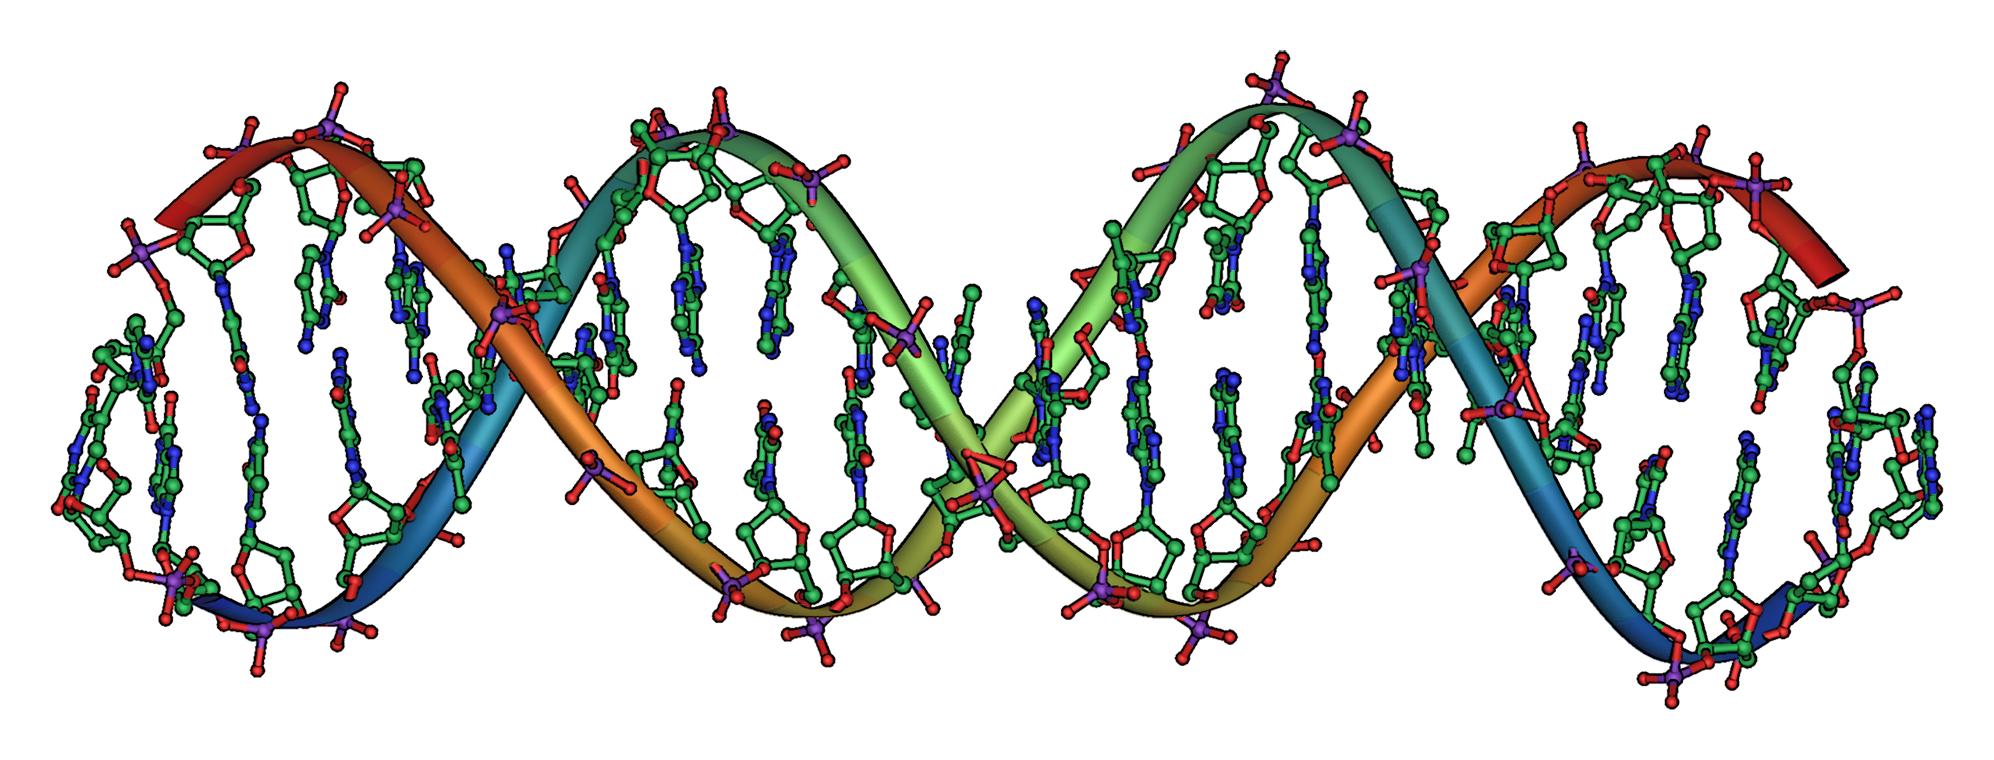 DNA_Overview_landscape_orientation